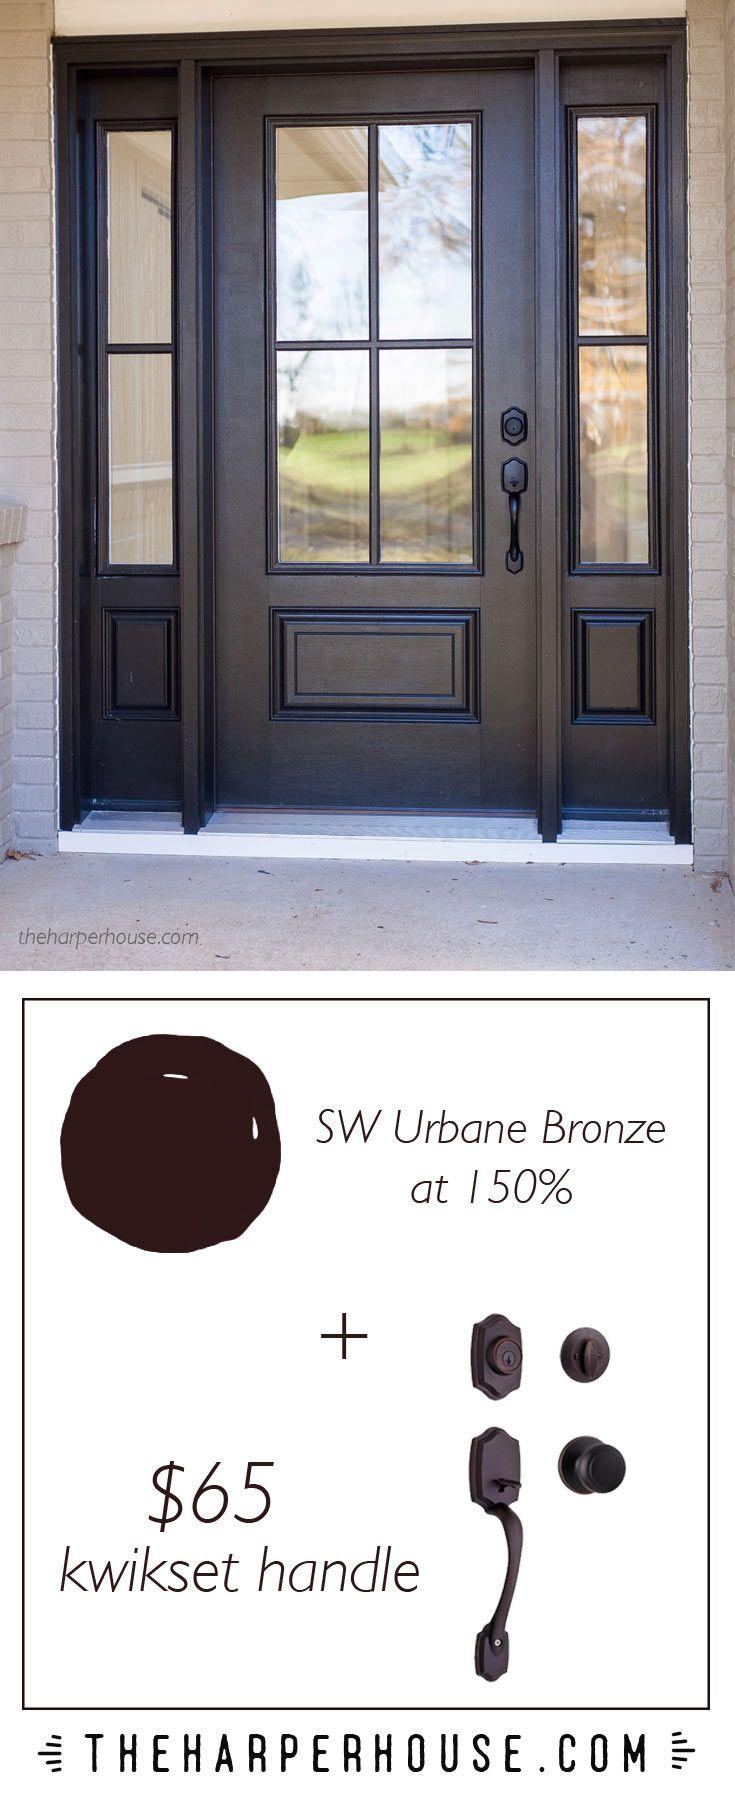 Modern Farmhouse Interior Door Knobs & Modern Farmhouse Interior Door Knobs | Front doors Doors and House Pezcame.Com